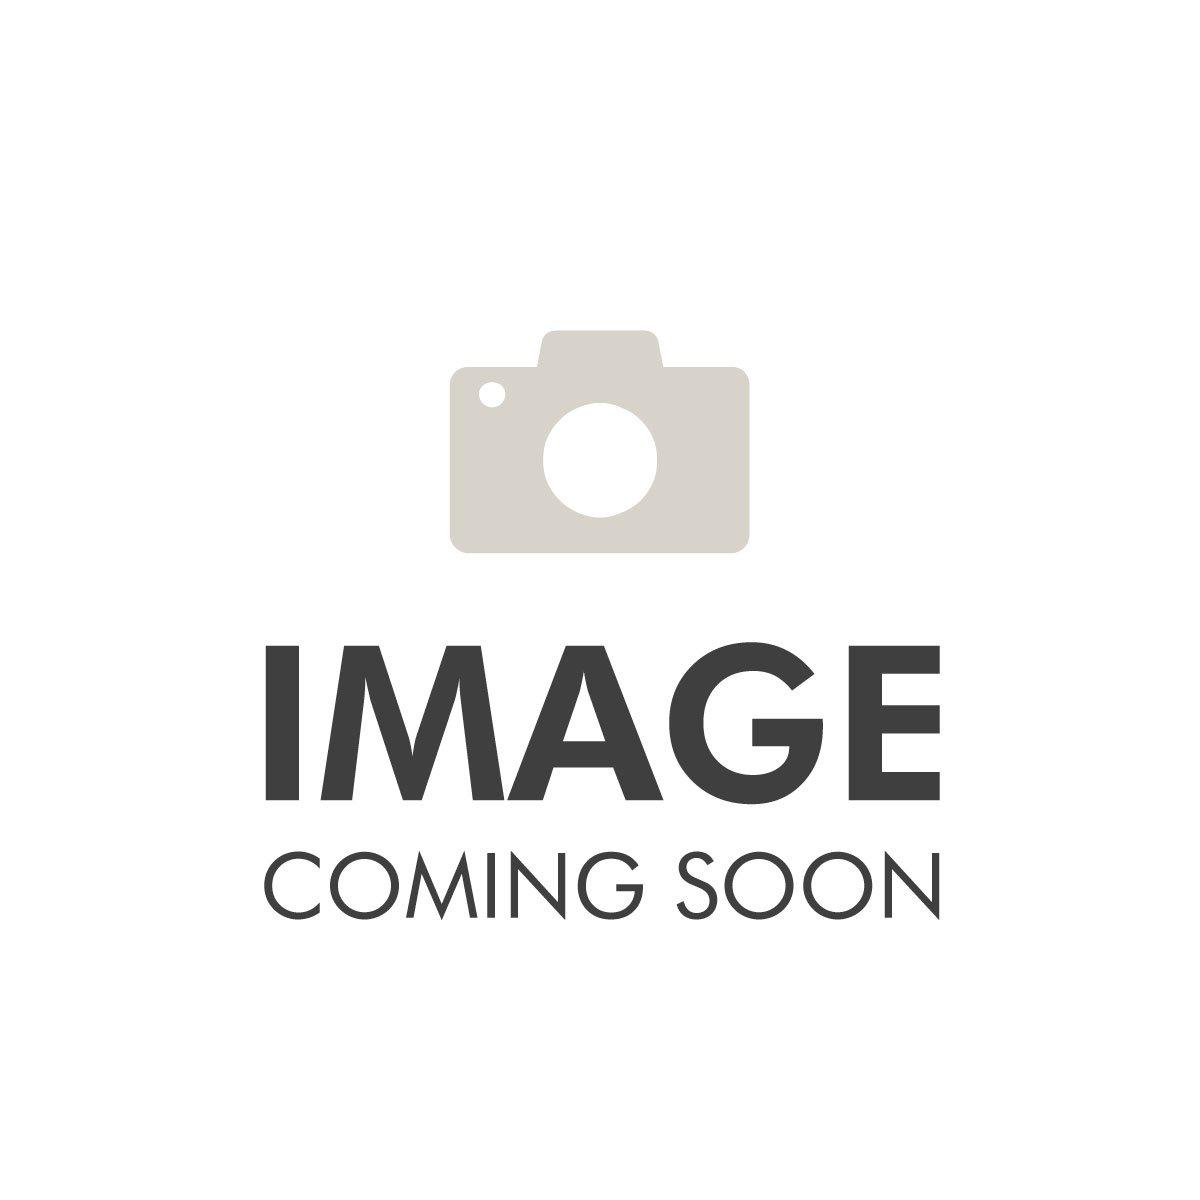 Lolita Lempicka Elle L'Aime 40ml EDP Spray